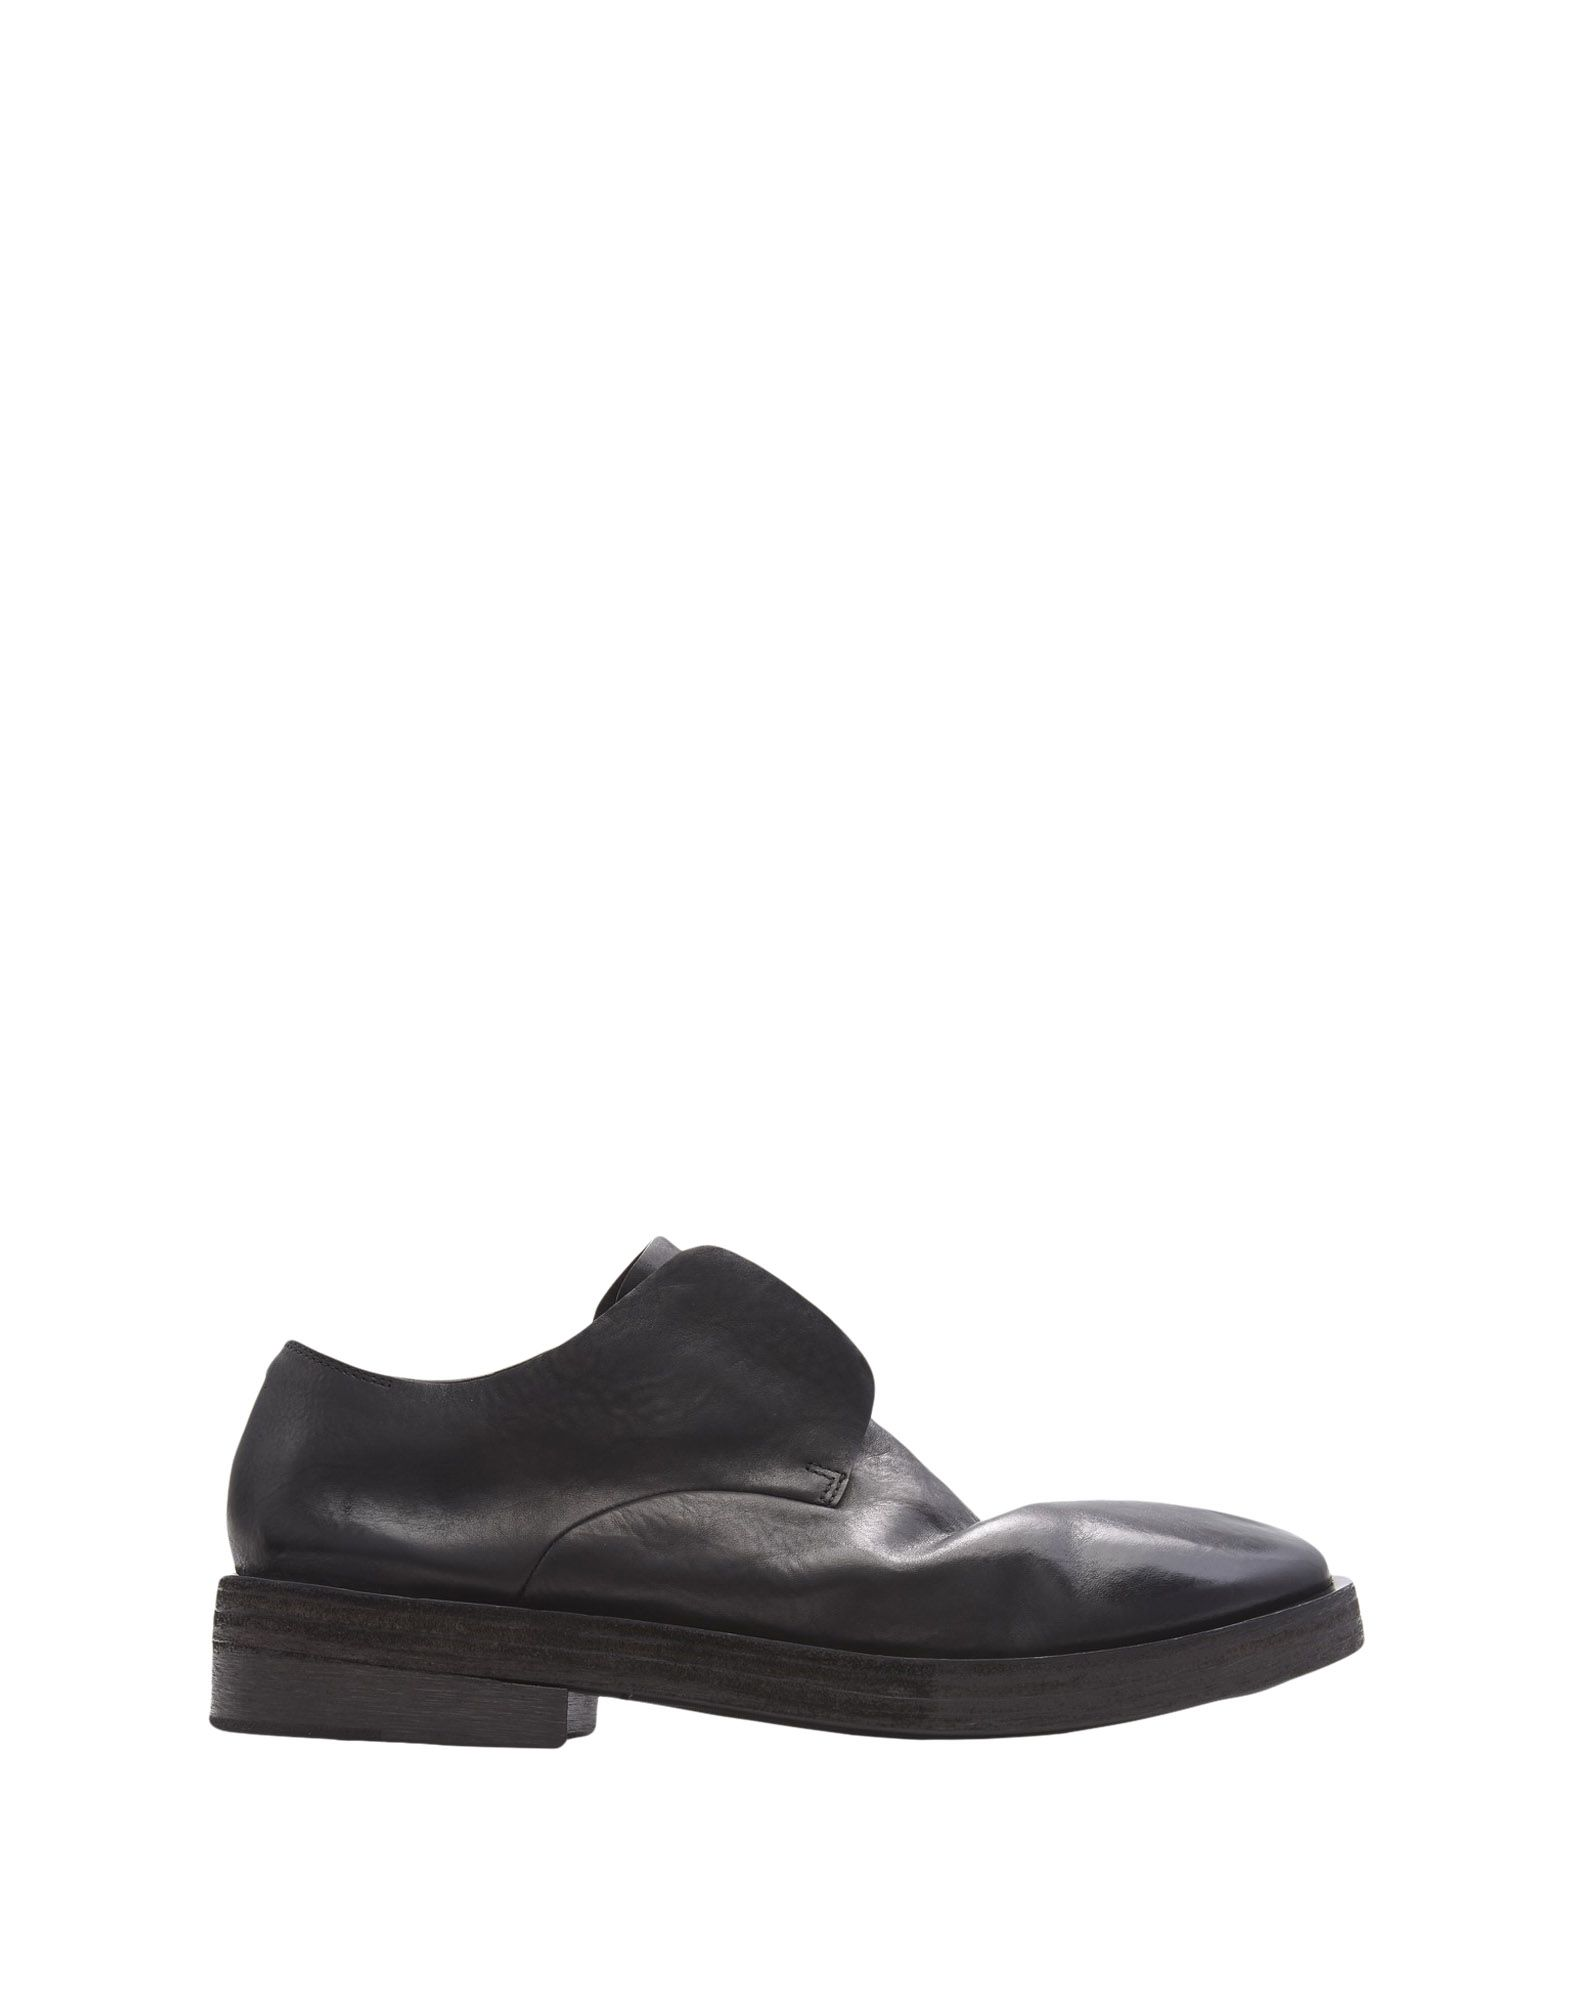 Marsèll Mokassins Herren  11524589EG Gute Qualität beliebte Schuhe